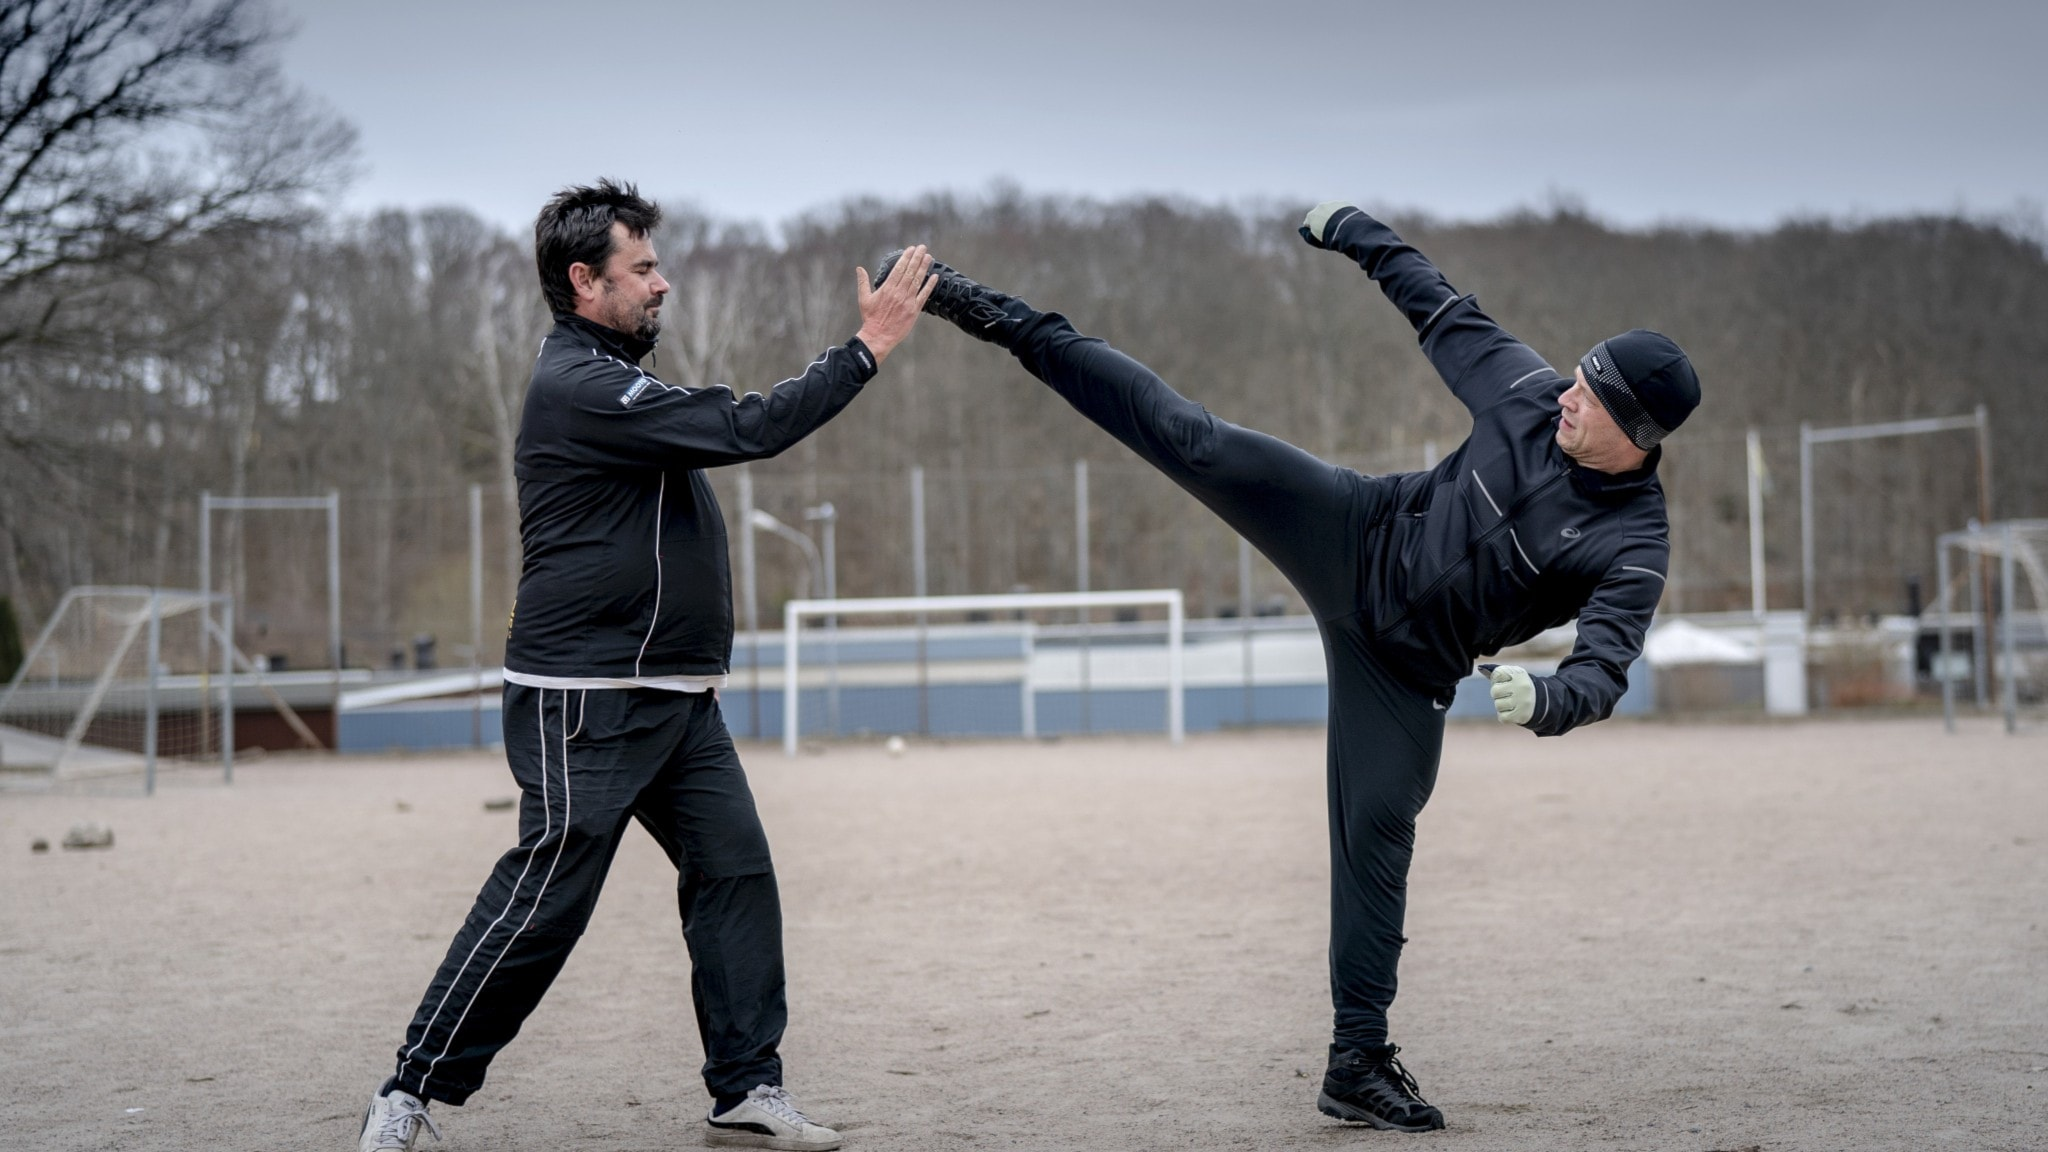 Two people performing taekwon-do.